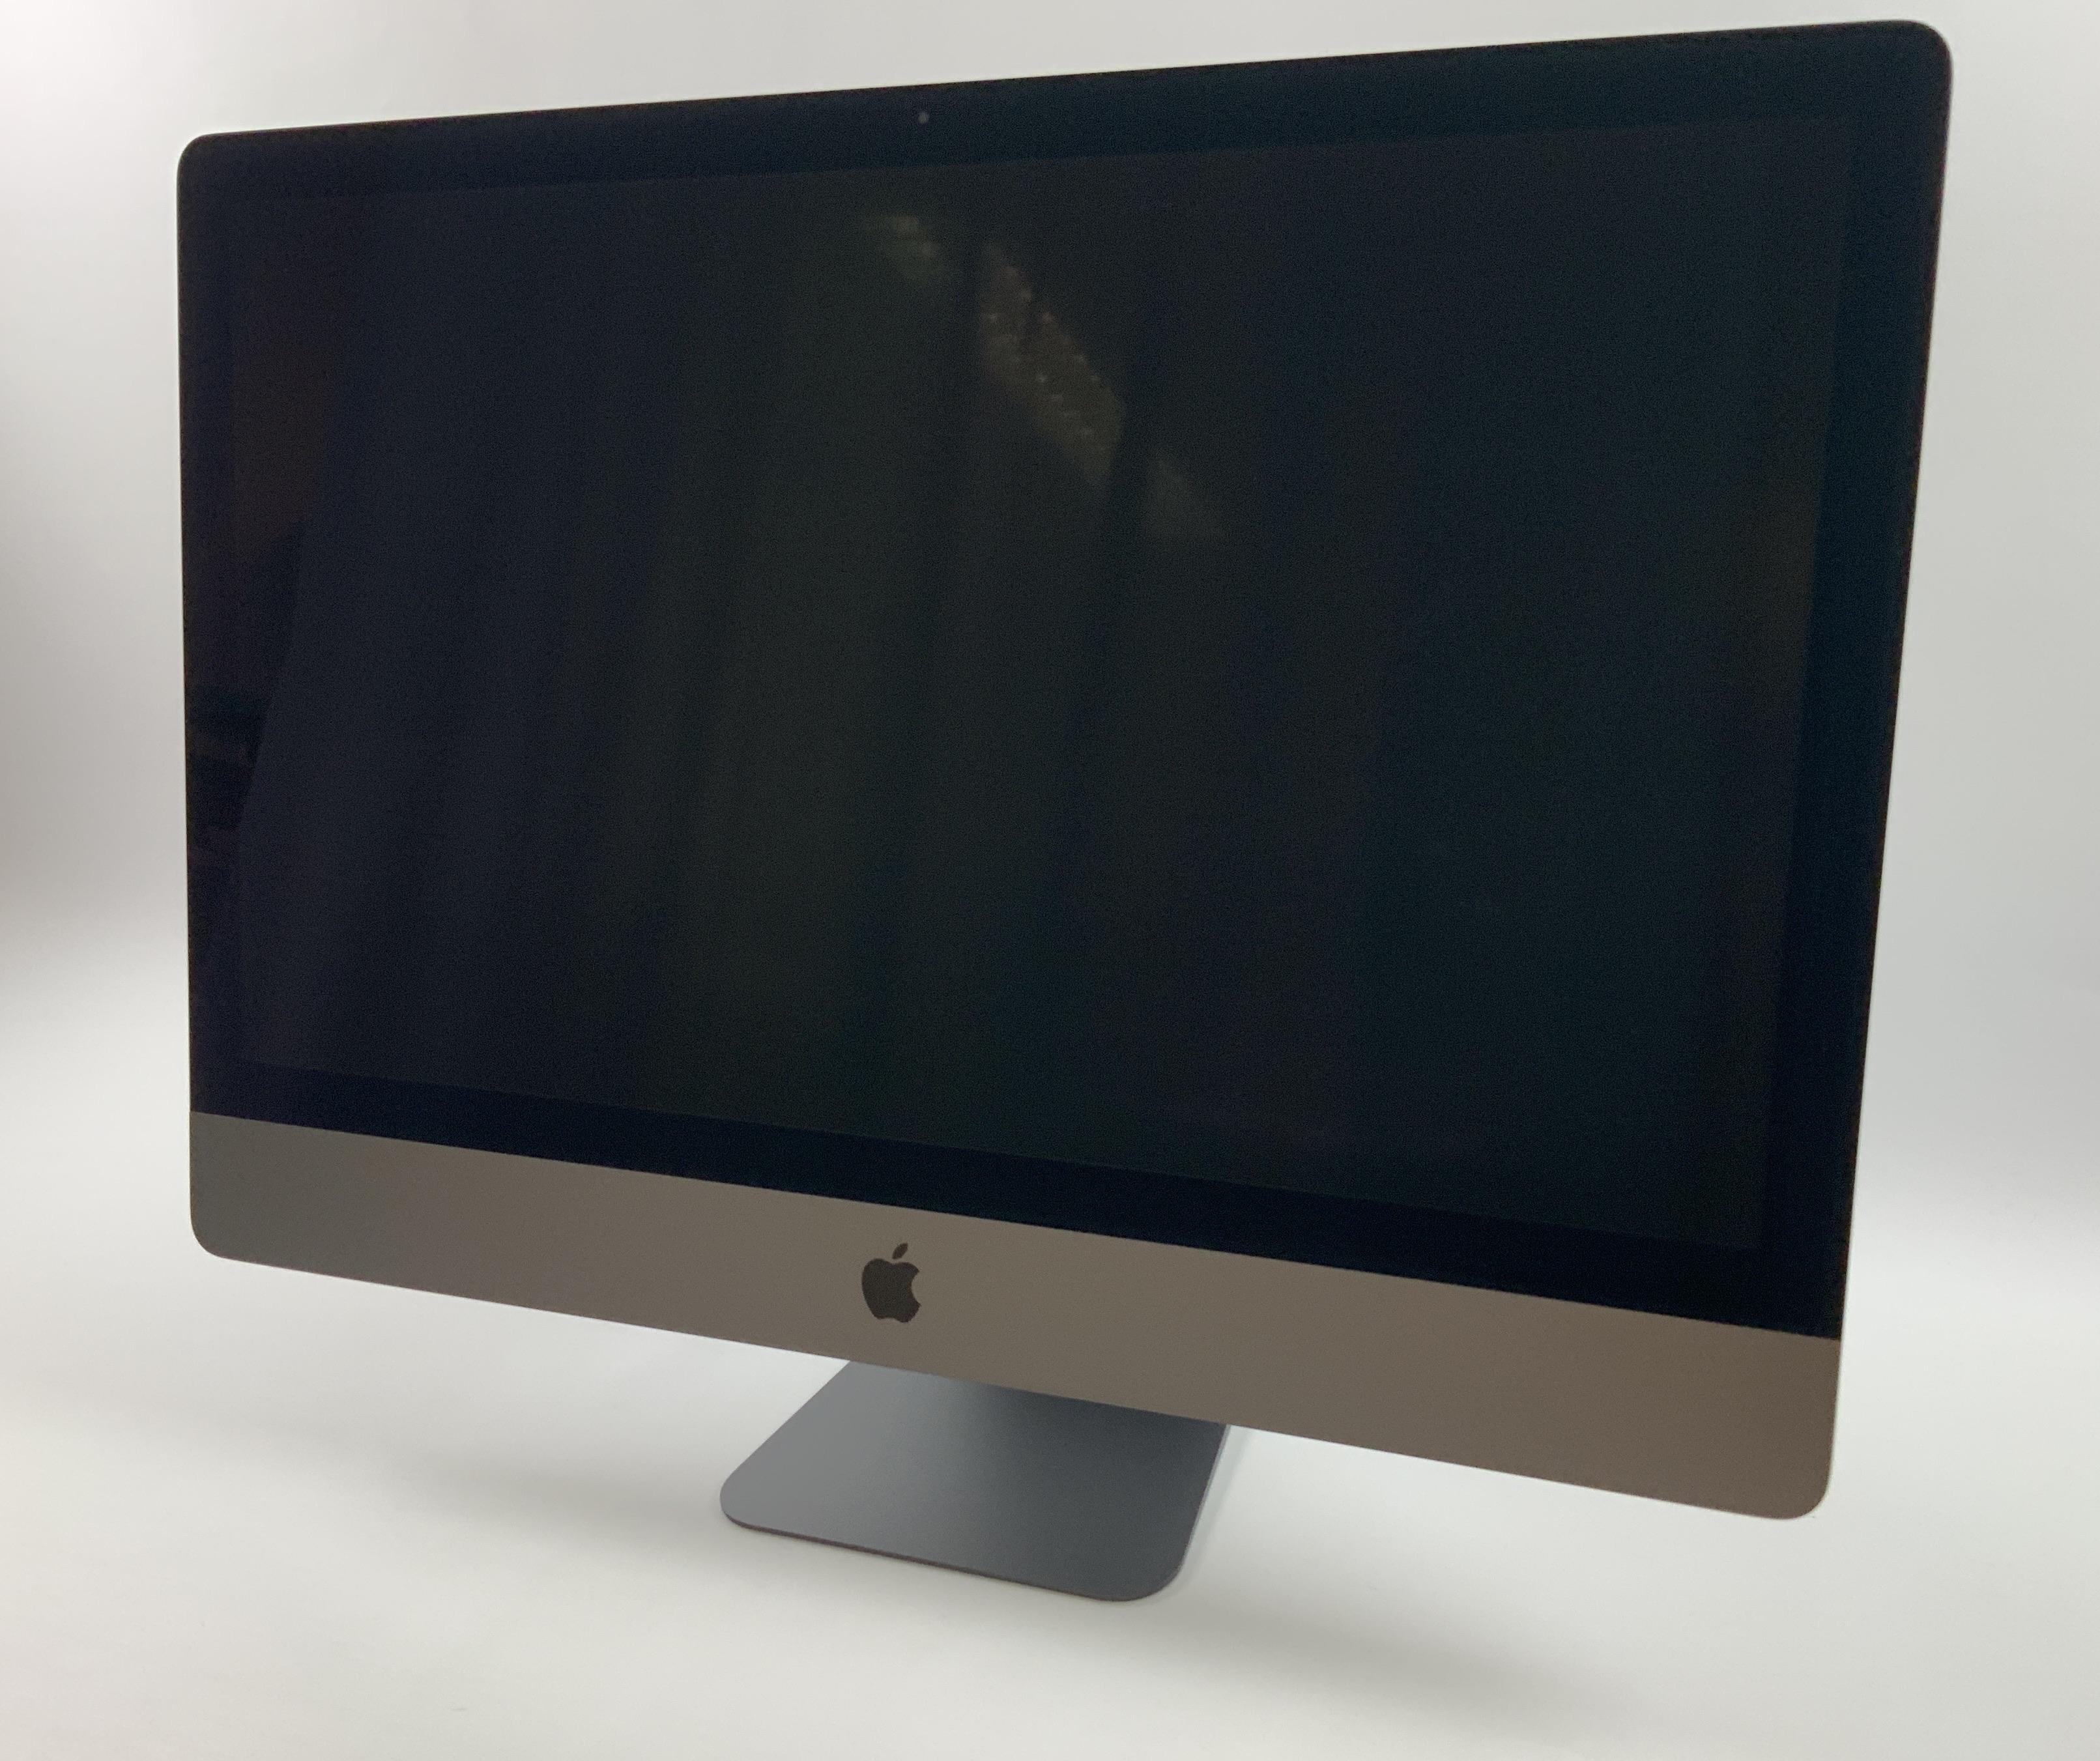 iMac Pro 2017 (Intel 8-Core Xeon W 3.2 GHz 32 GB RAM 1 TB SSD), Intel 8-Core Xeon W 3.2 GHz, 32 GB RAM, 1 TB SSD, image 1